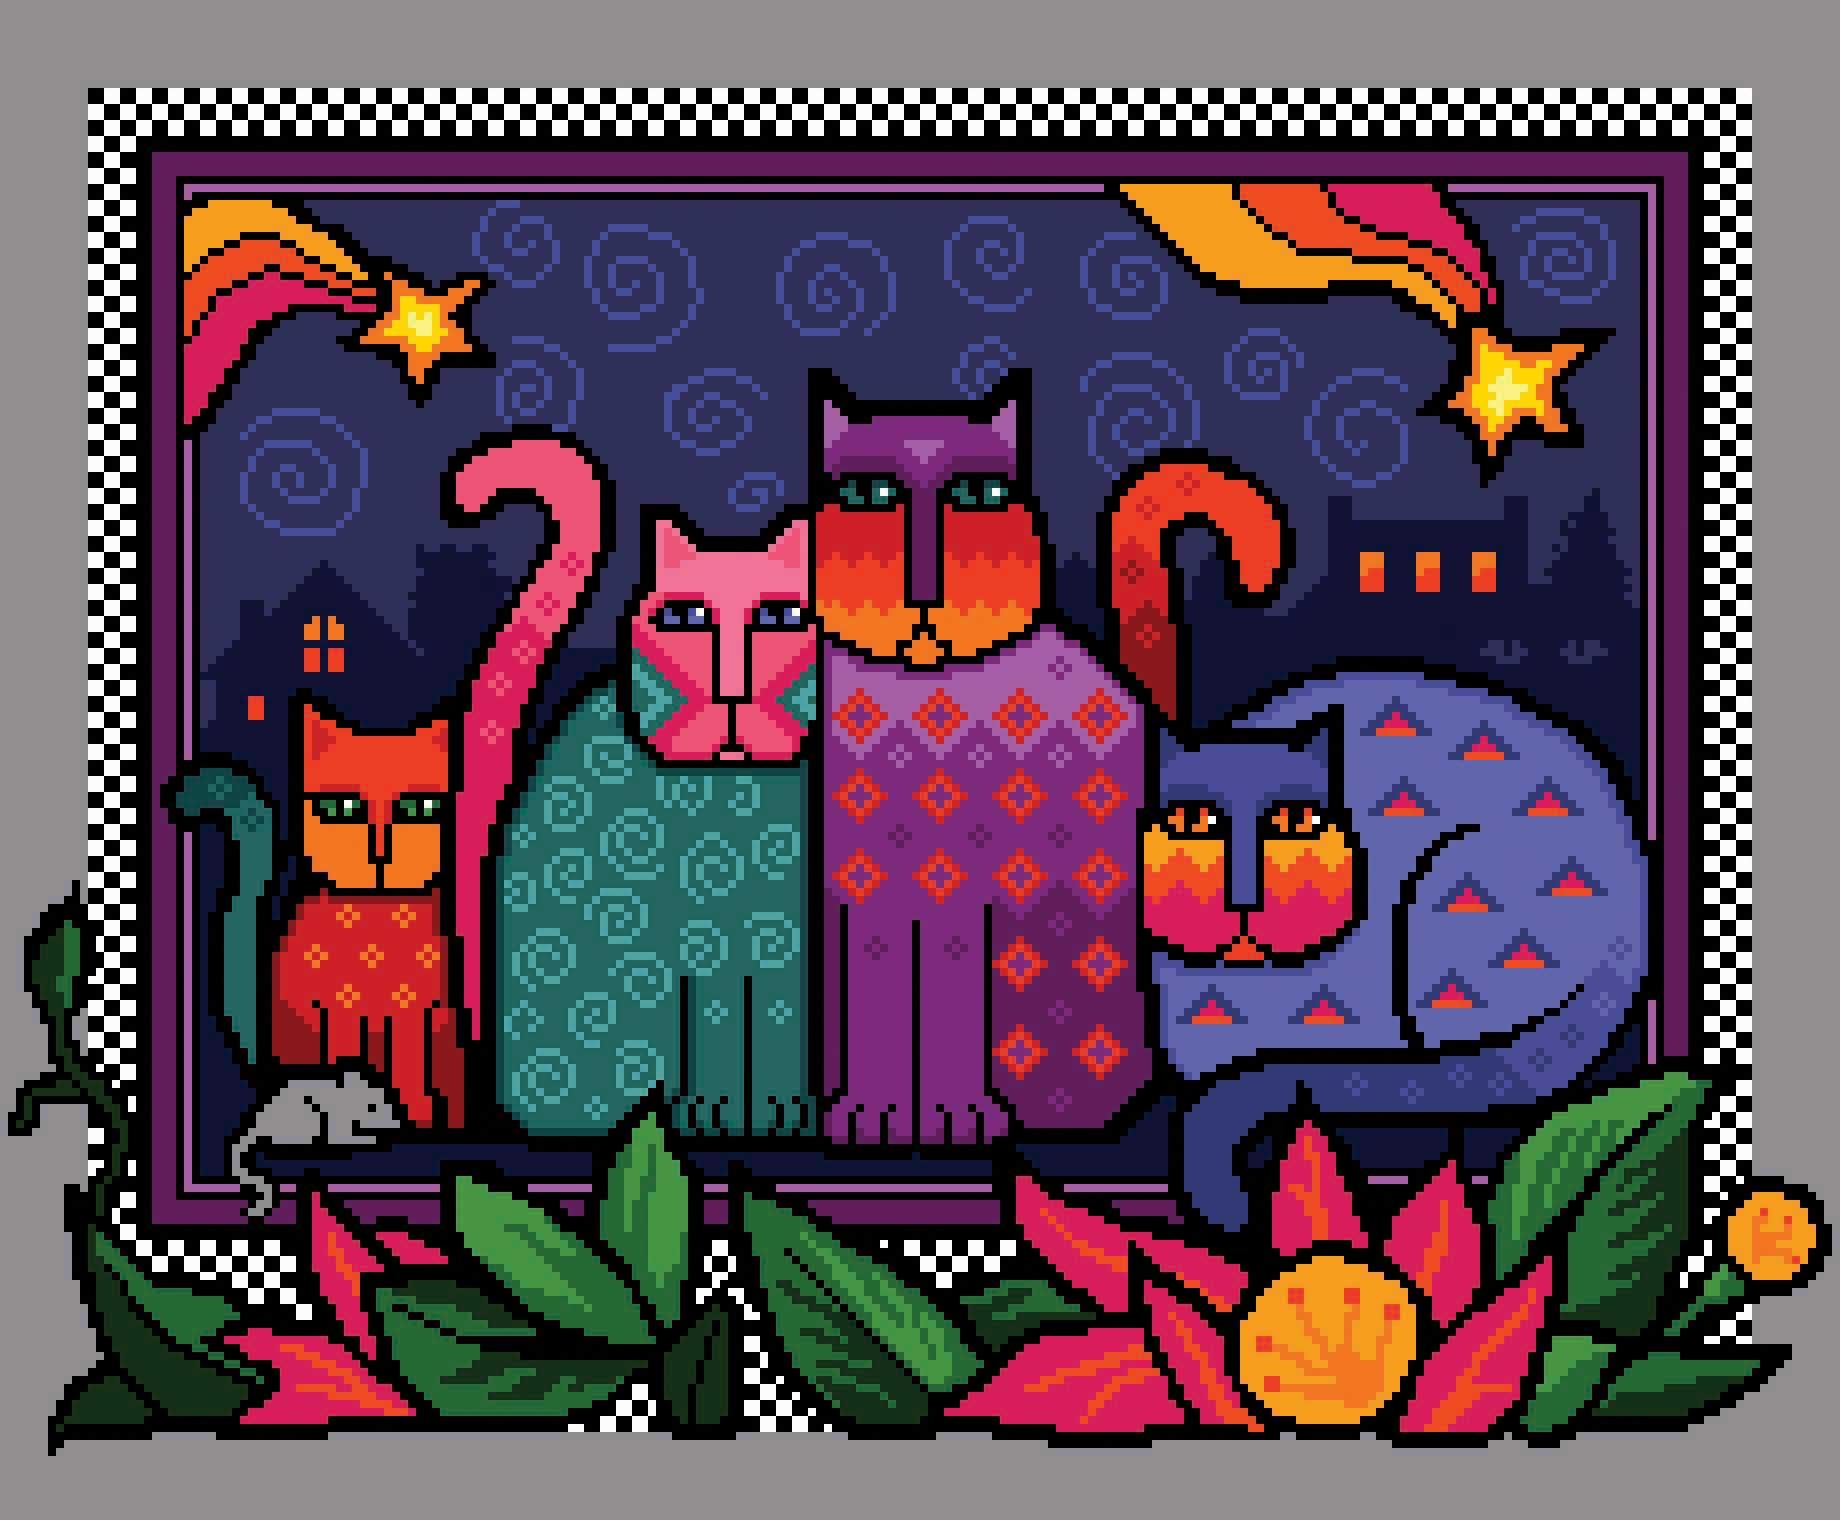 Midnight Moggies from Cross Stitch Gold Magazine. Cross stitch chart design by Vivienne Powers PDF £6.